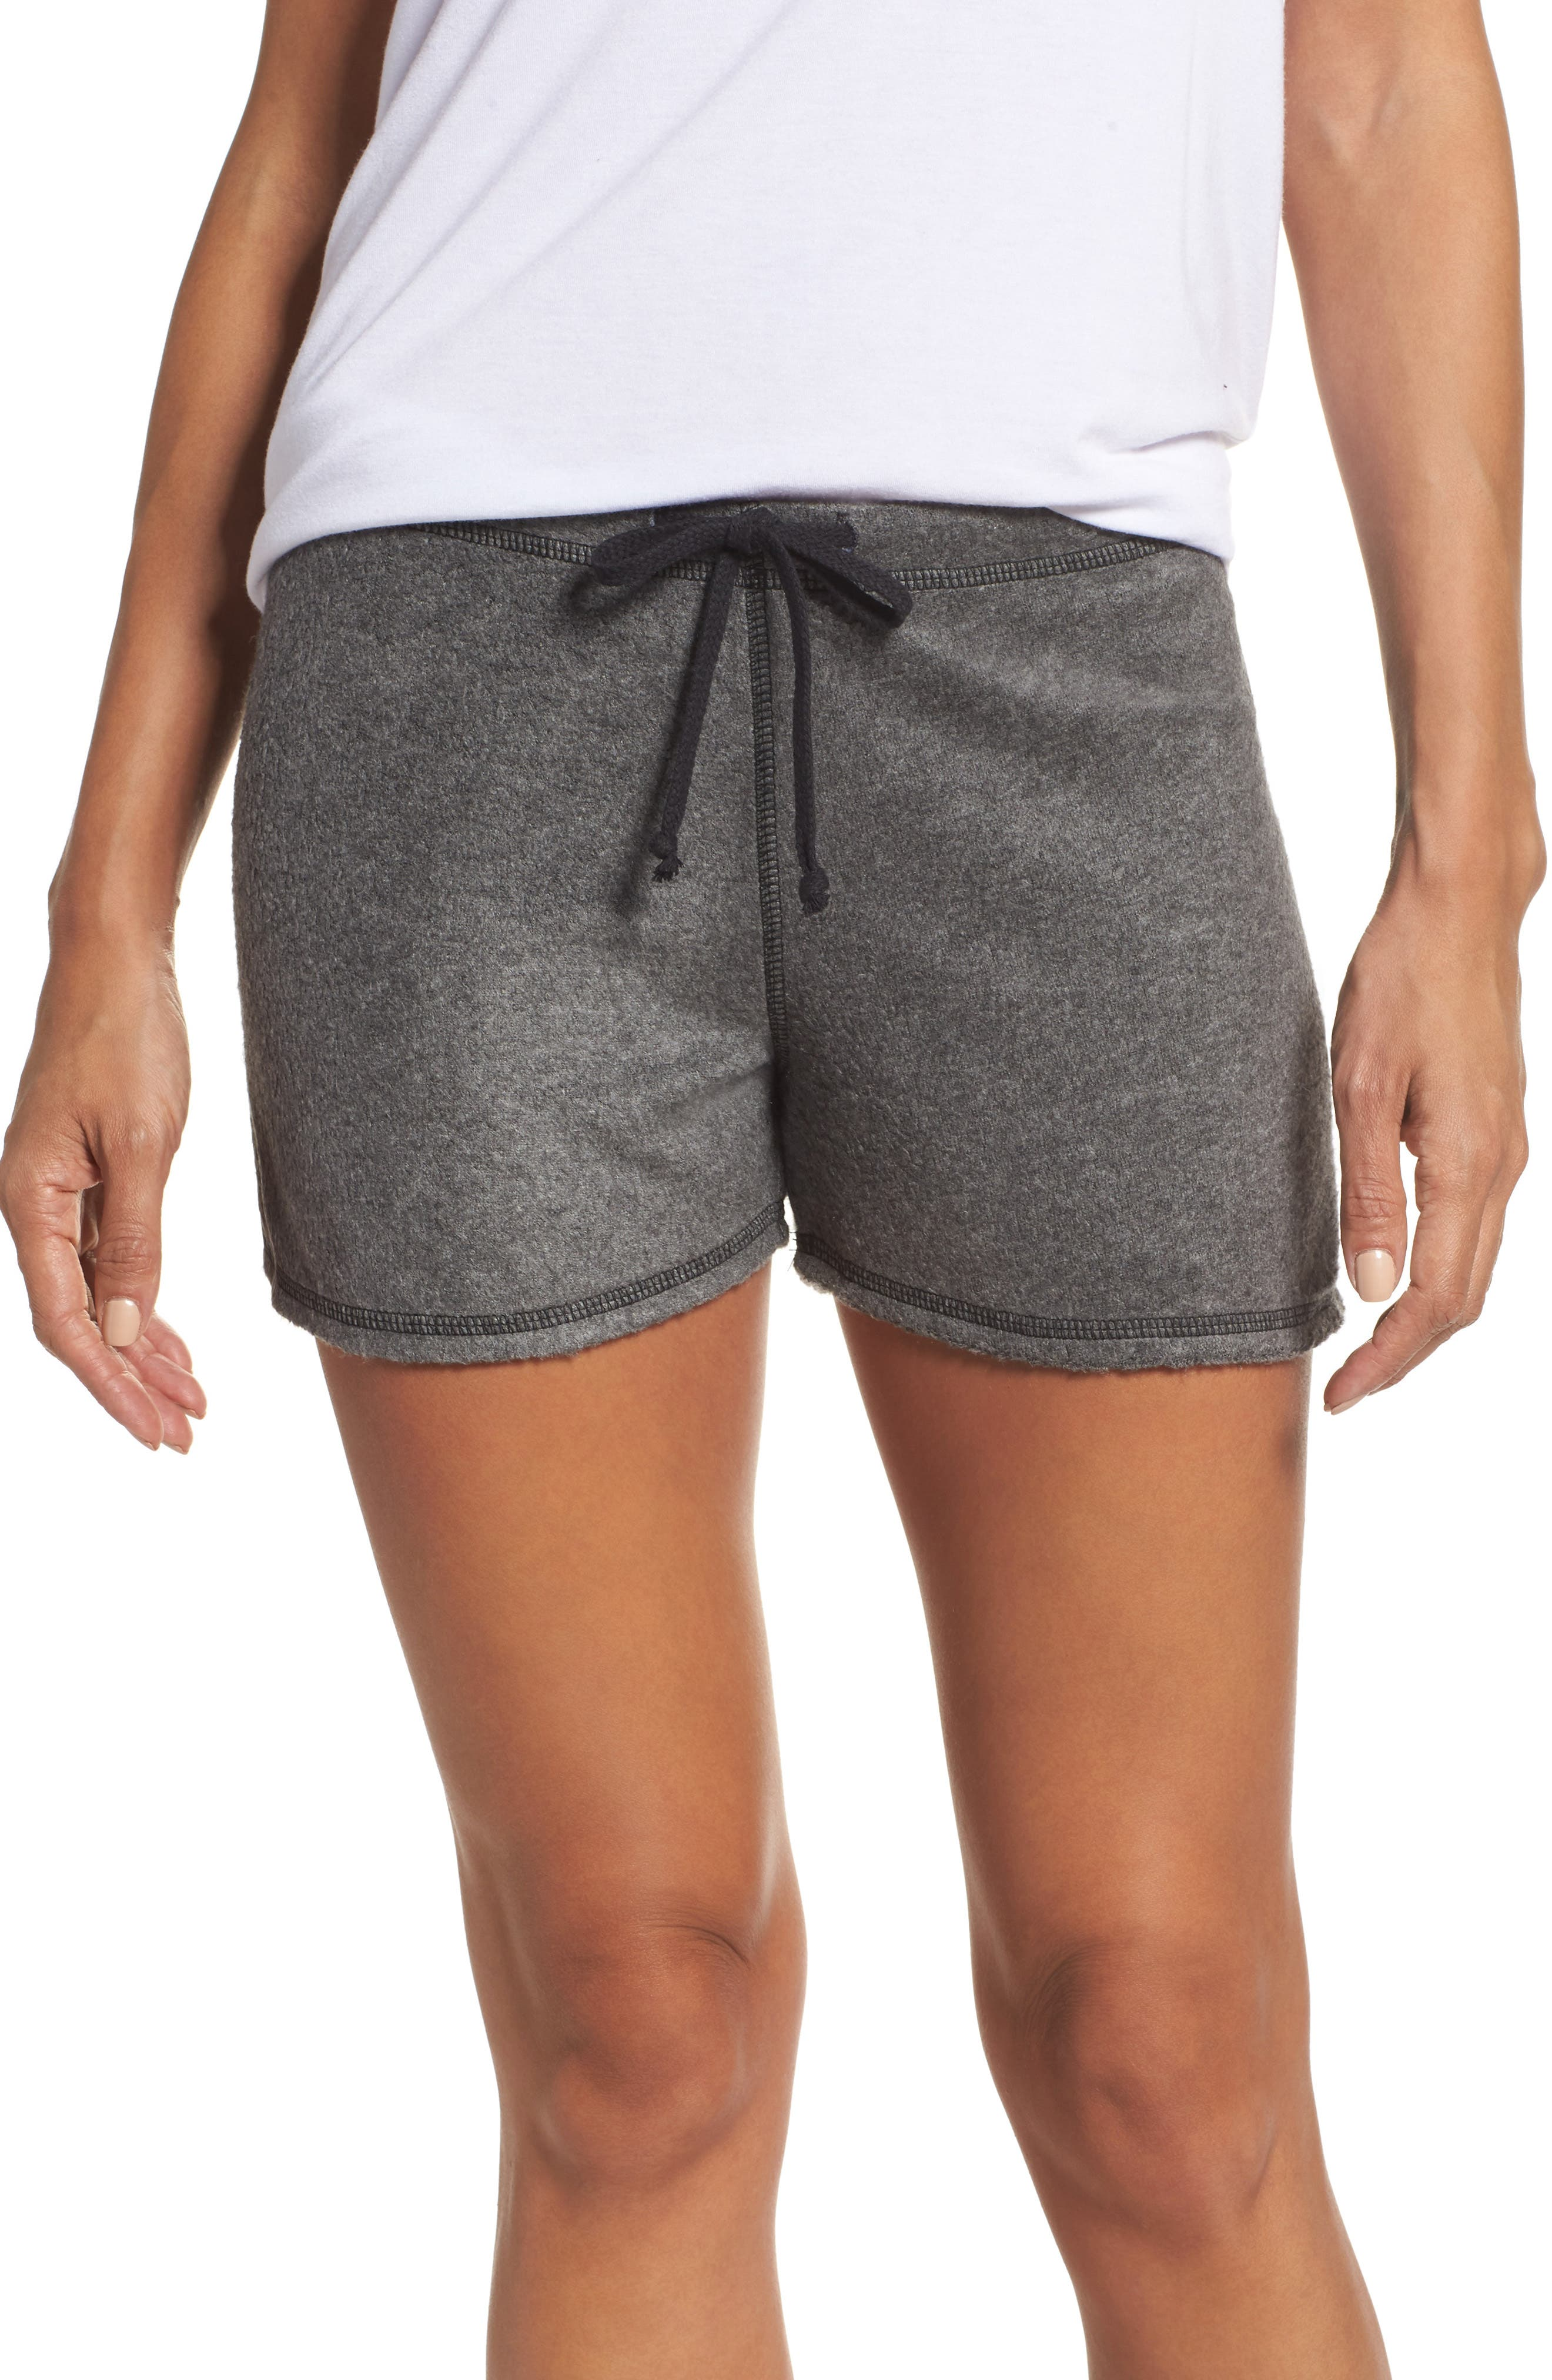 Traci Fleece Lounge Shorts,                         Main,                         color, Charcoal